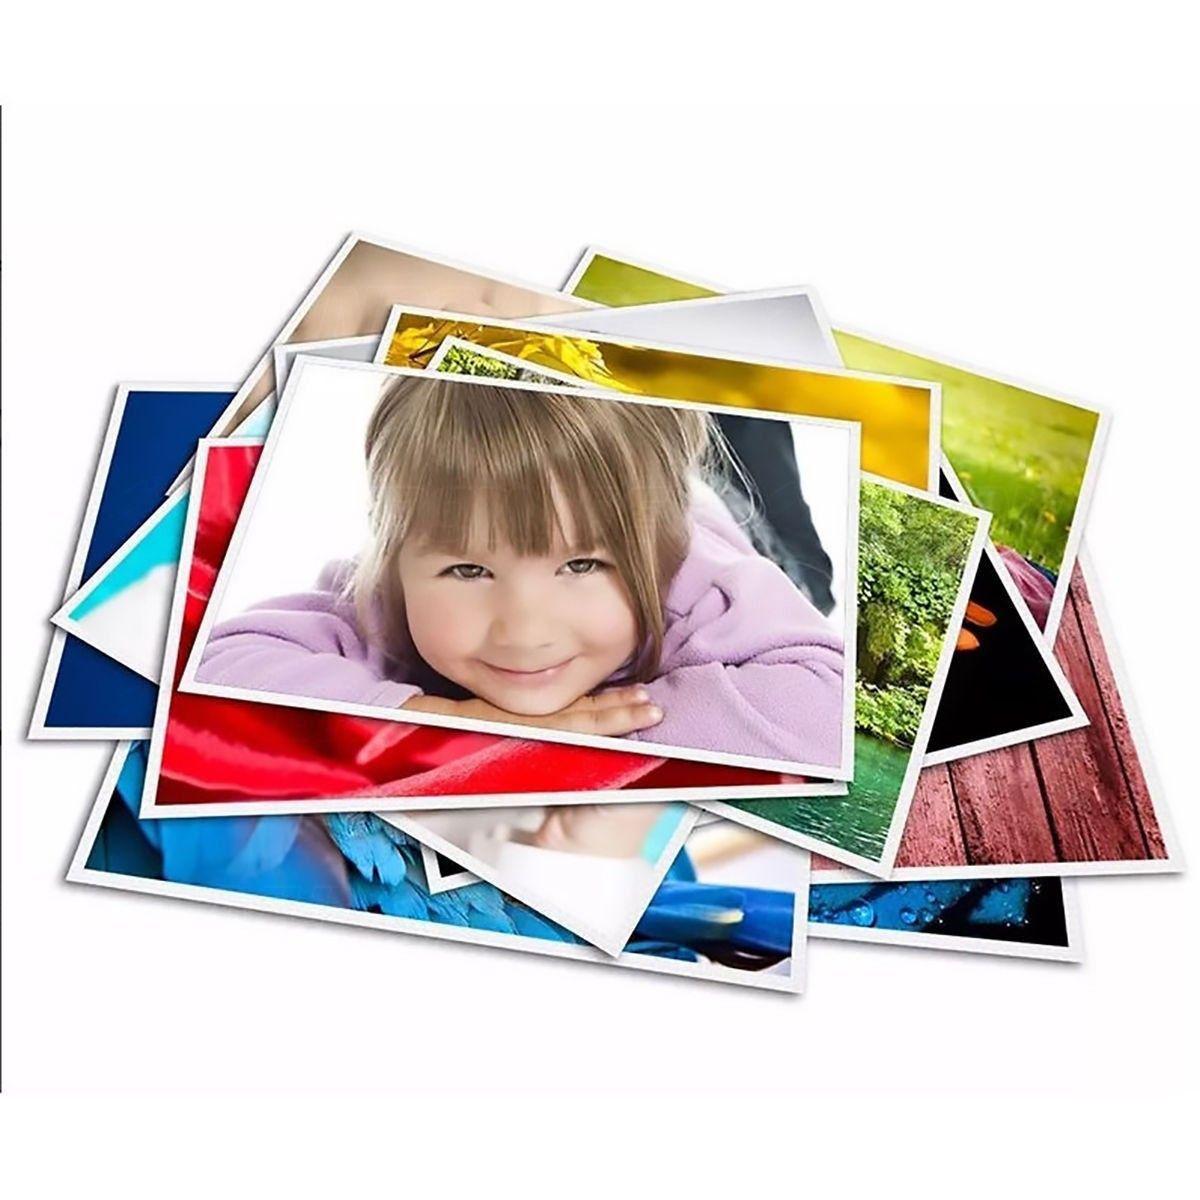 Papel Fotográfico Matte Fosco 108g A4 Branco Resistente à Água / 100 folhas